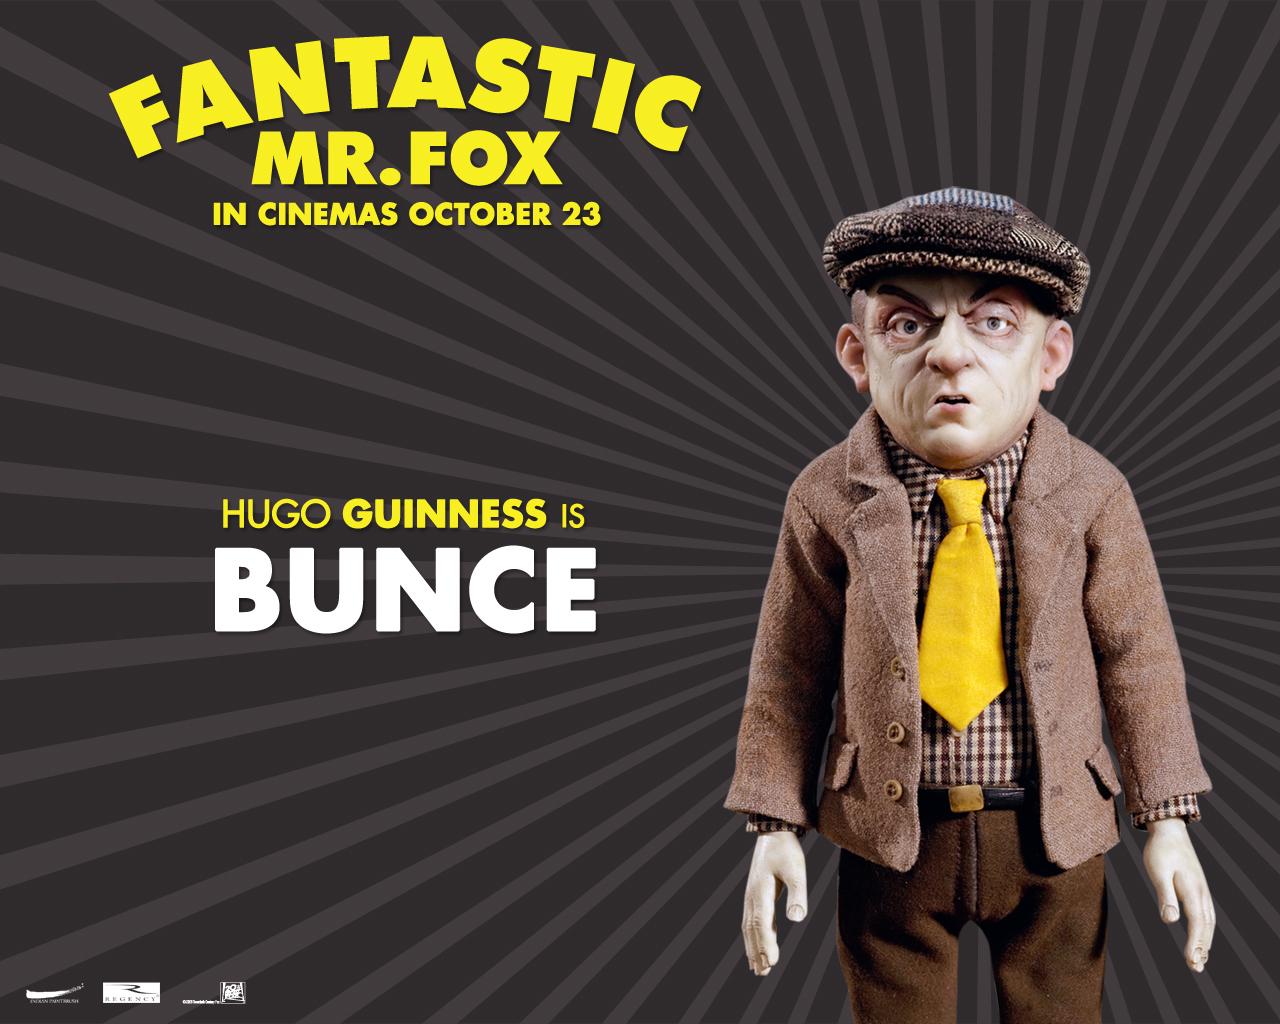 Fantastic Mr Fox Wallpaper Bunice Fantastic Mr Fox Wallpaper 11894982 Fanpop